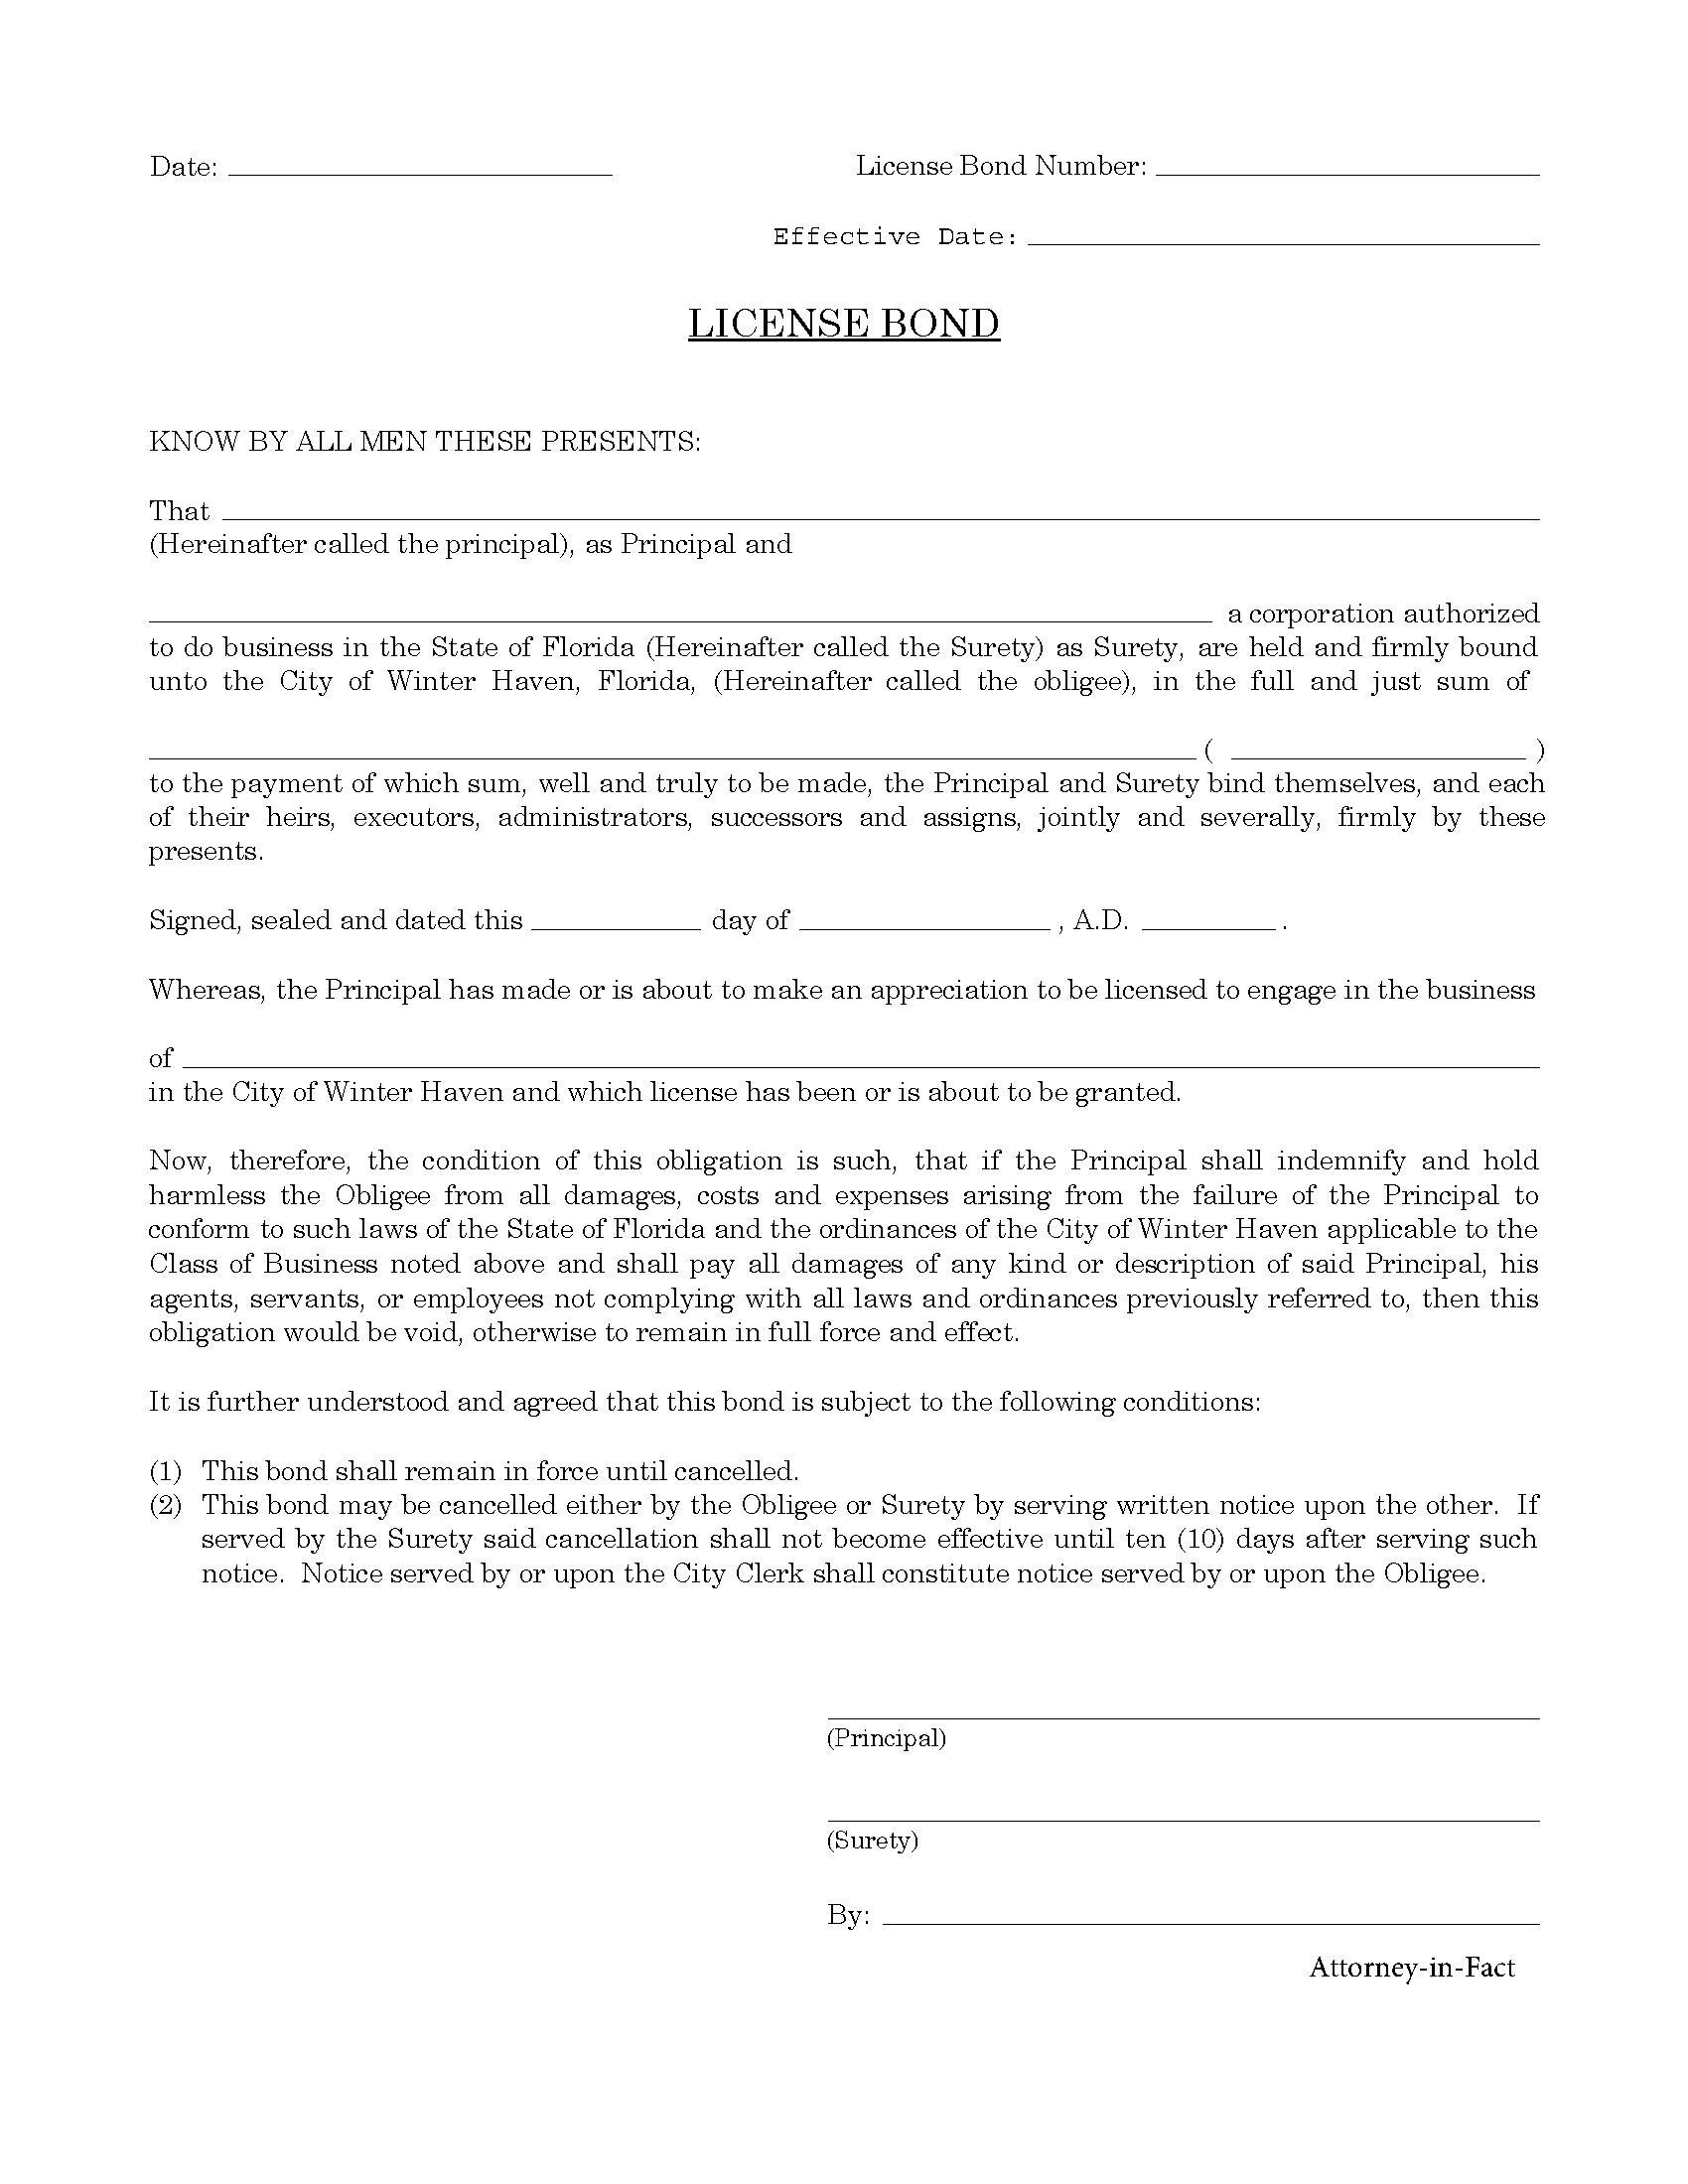 Winter Haven - City License/Permit Bond sample image